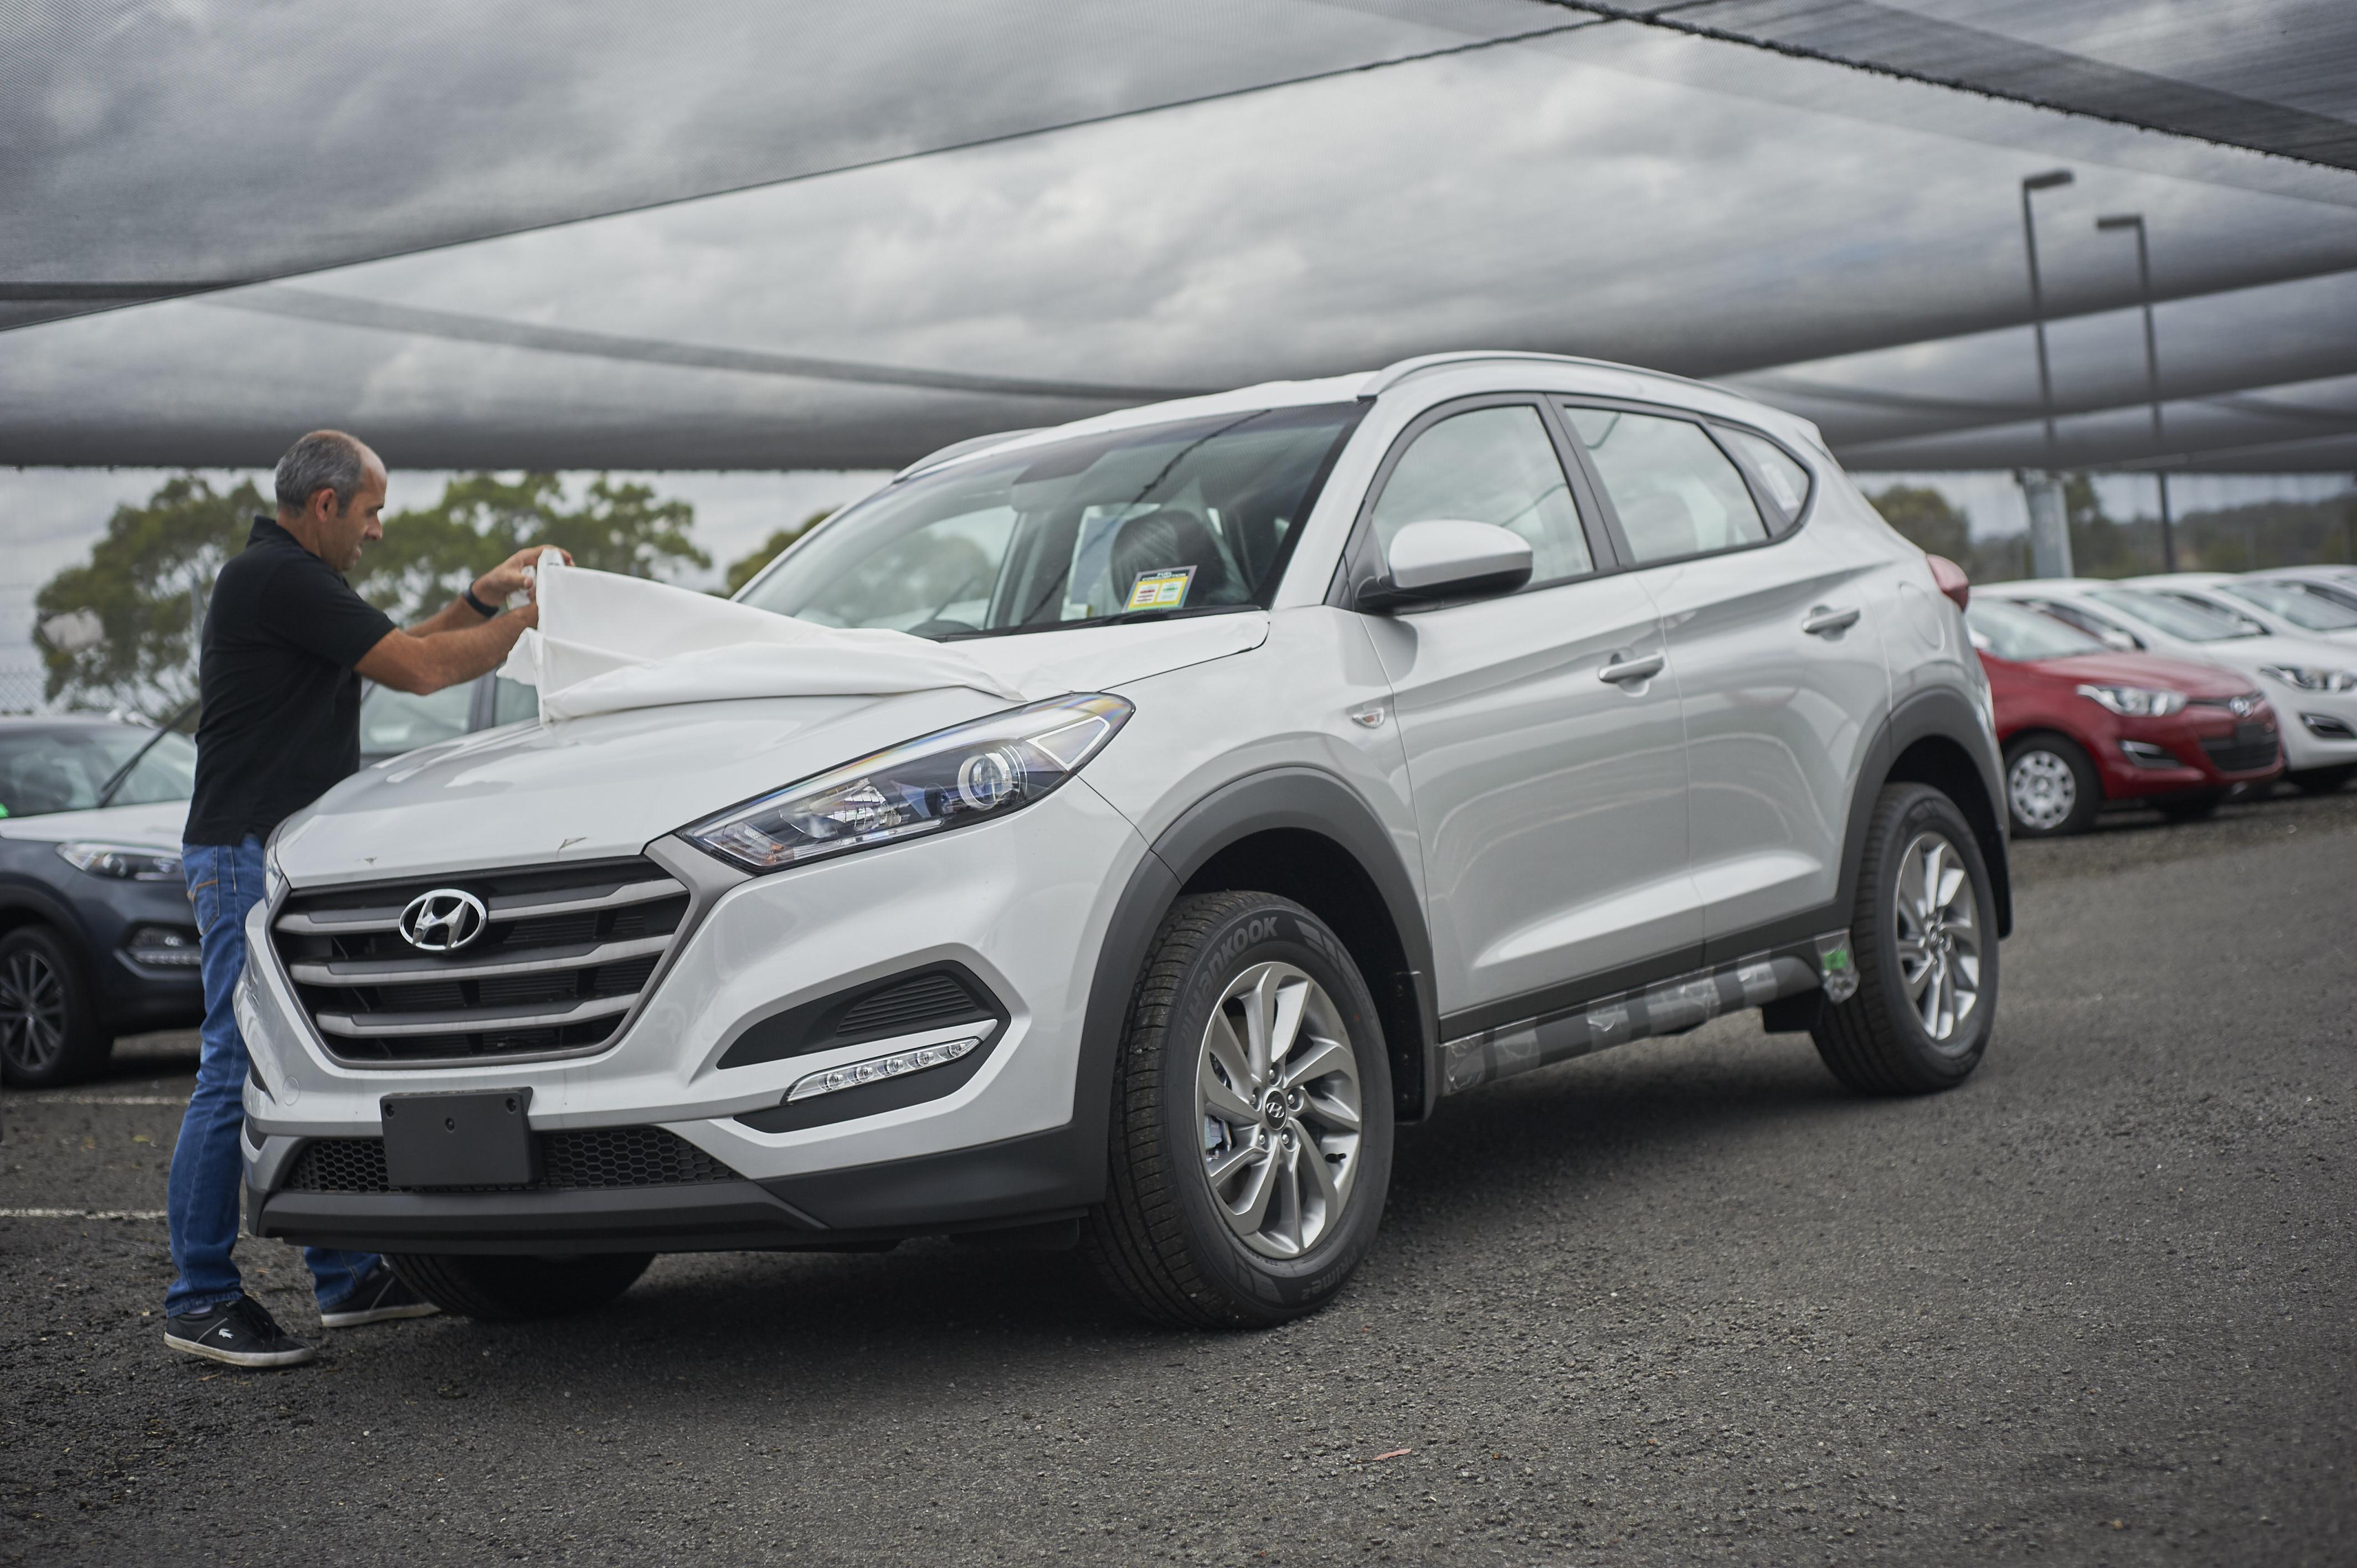 Elegant We Built A Hyundai Tucson From Scratch In The Czech